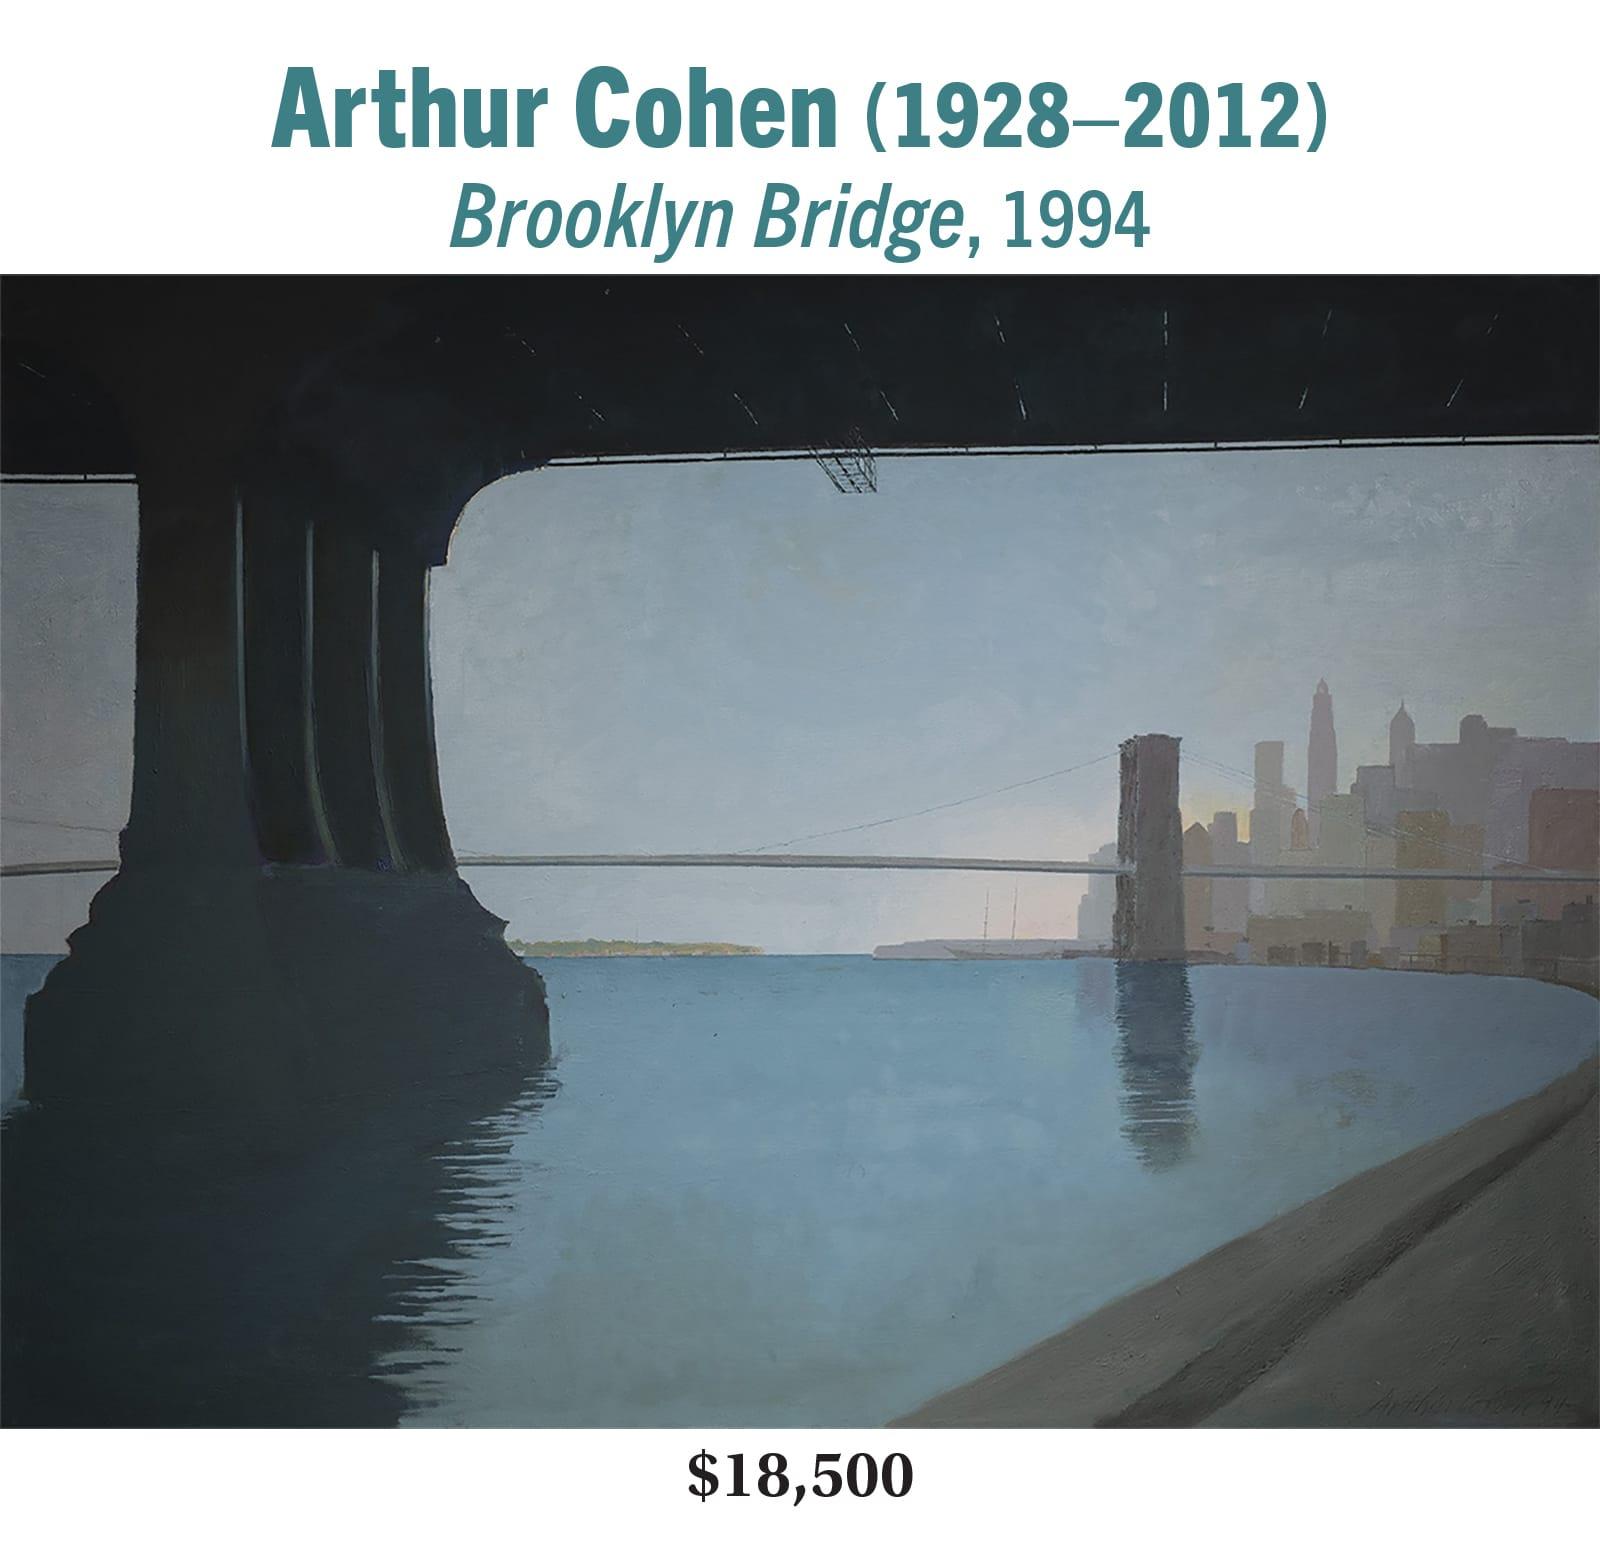 Arthur Cohen (1928–2012), Brooklyn Bridge, 1994, oil on canvas, American modernist cityscape painting